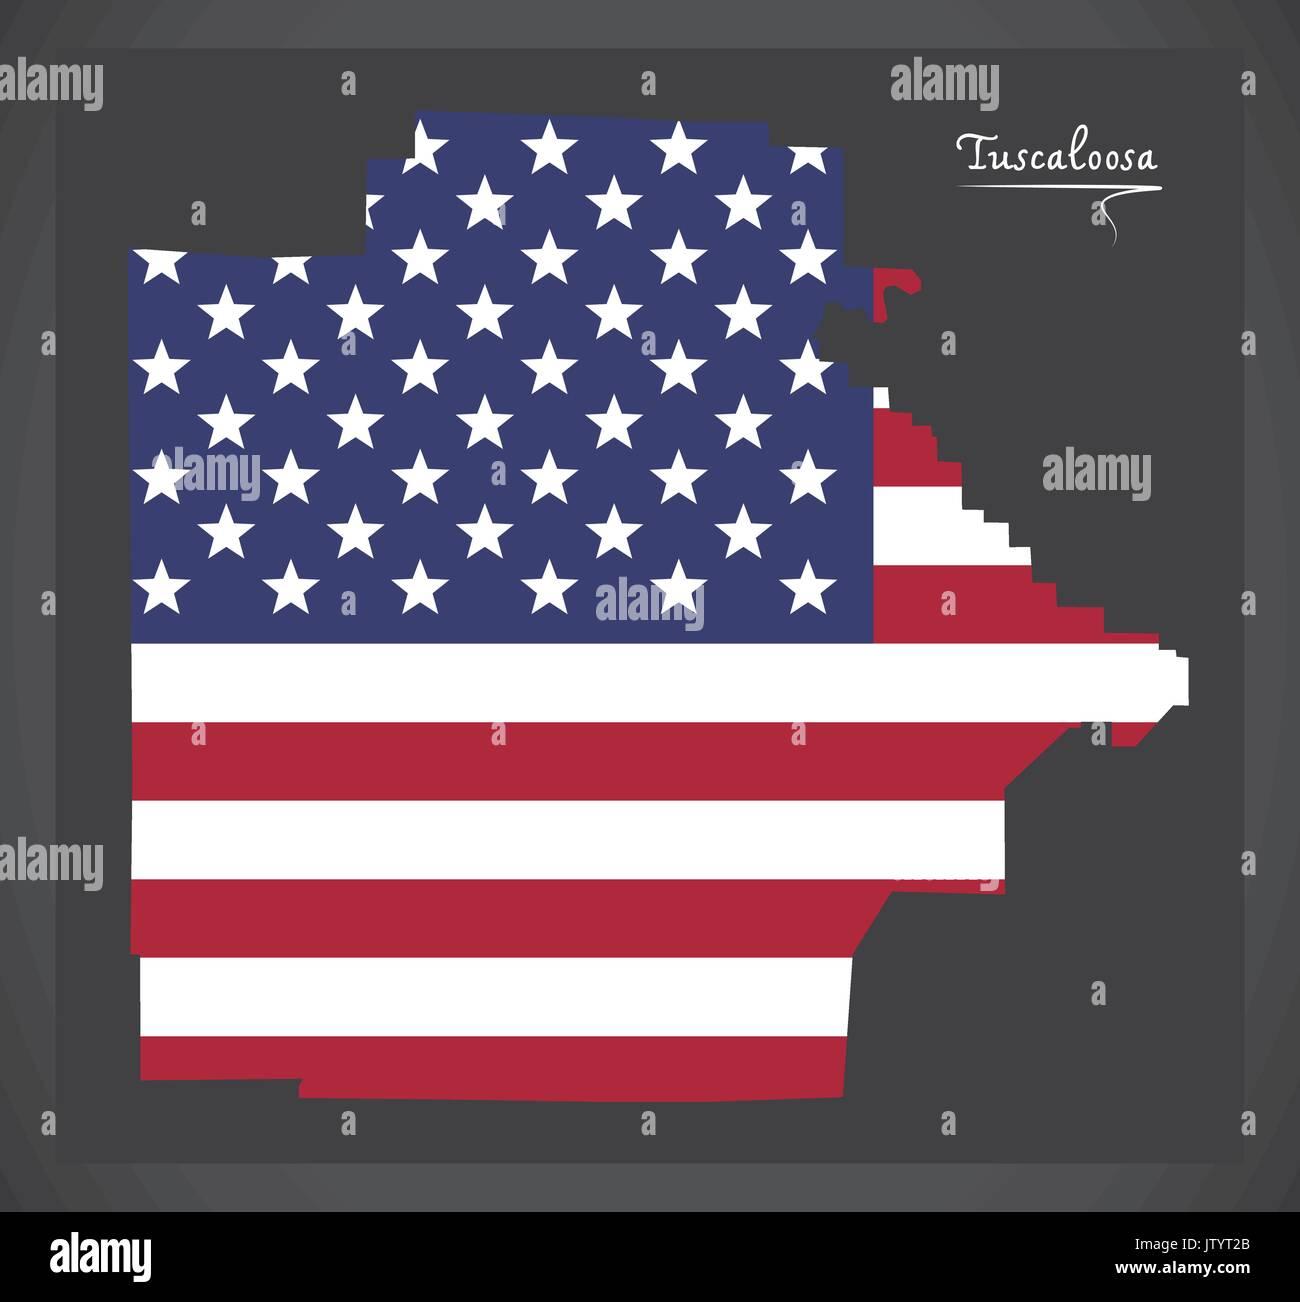 Tuscaloosa county map of Alabama USA with American national flag illustration - Stock Image